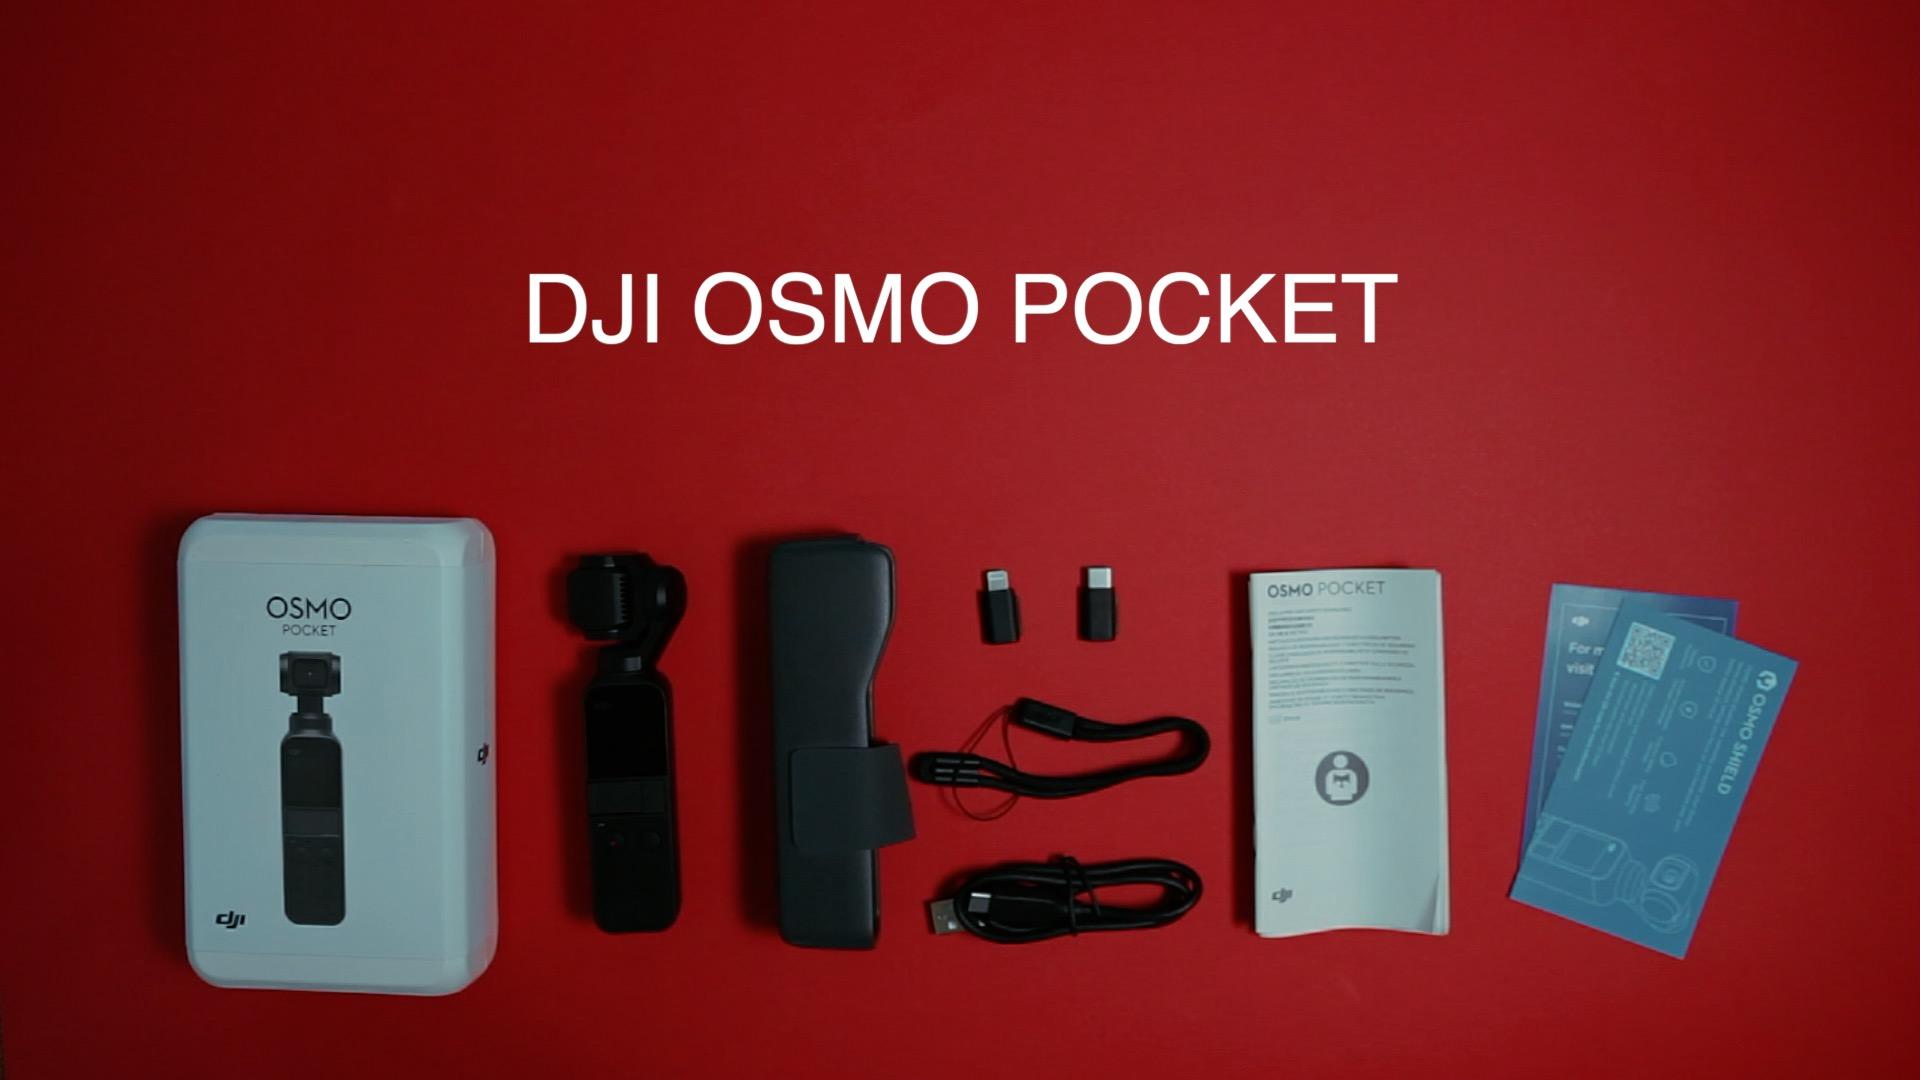 05 - Osmo Pocket unboxing 1.jpg